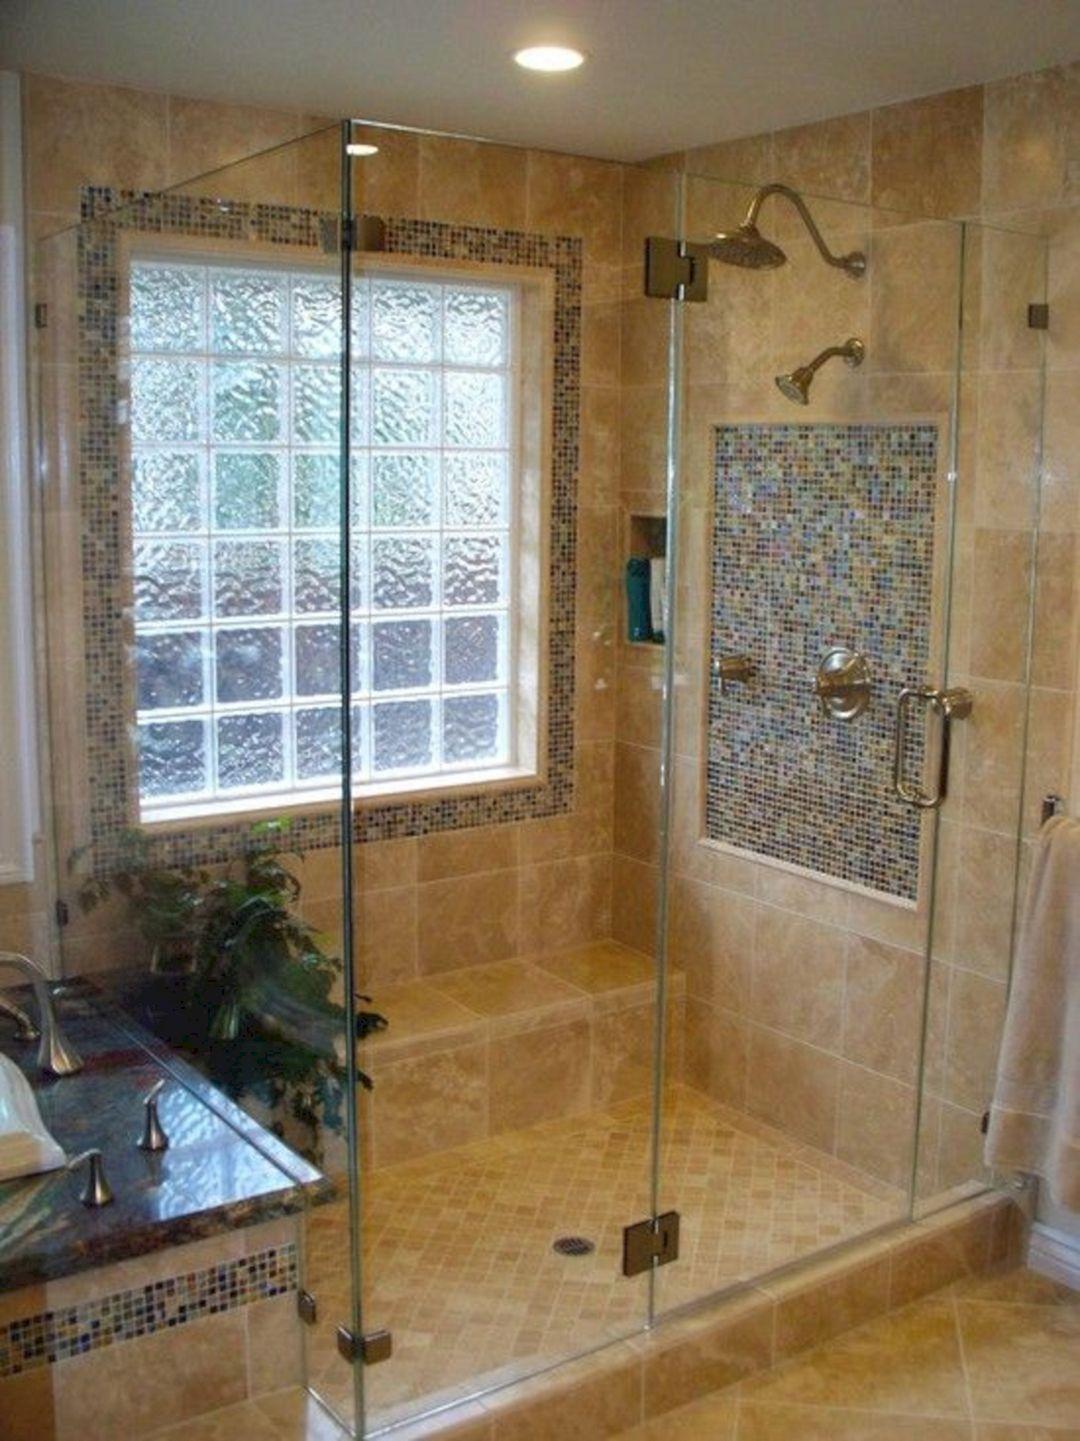 Top 45 Bathroom Window Design Ideas Bathroom Remodel Shower Window In Shower Small Bathroom Remodel